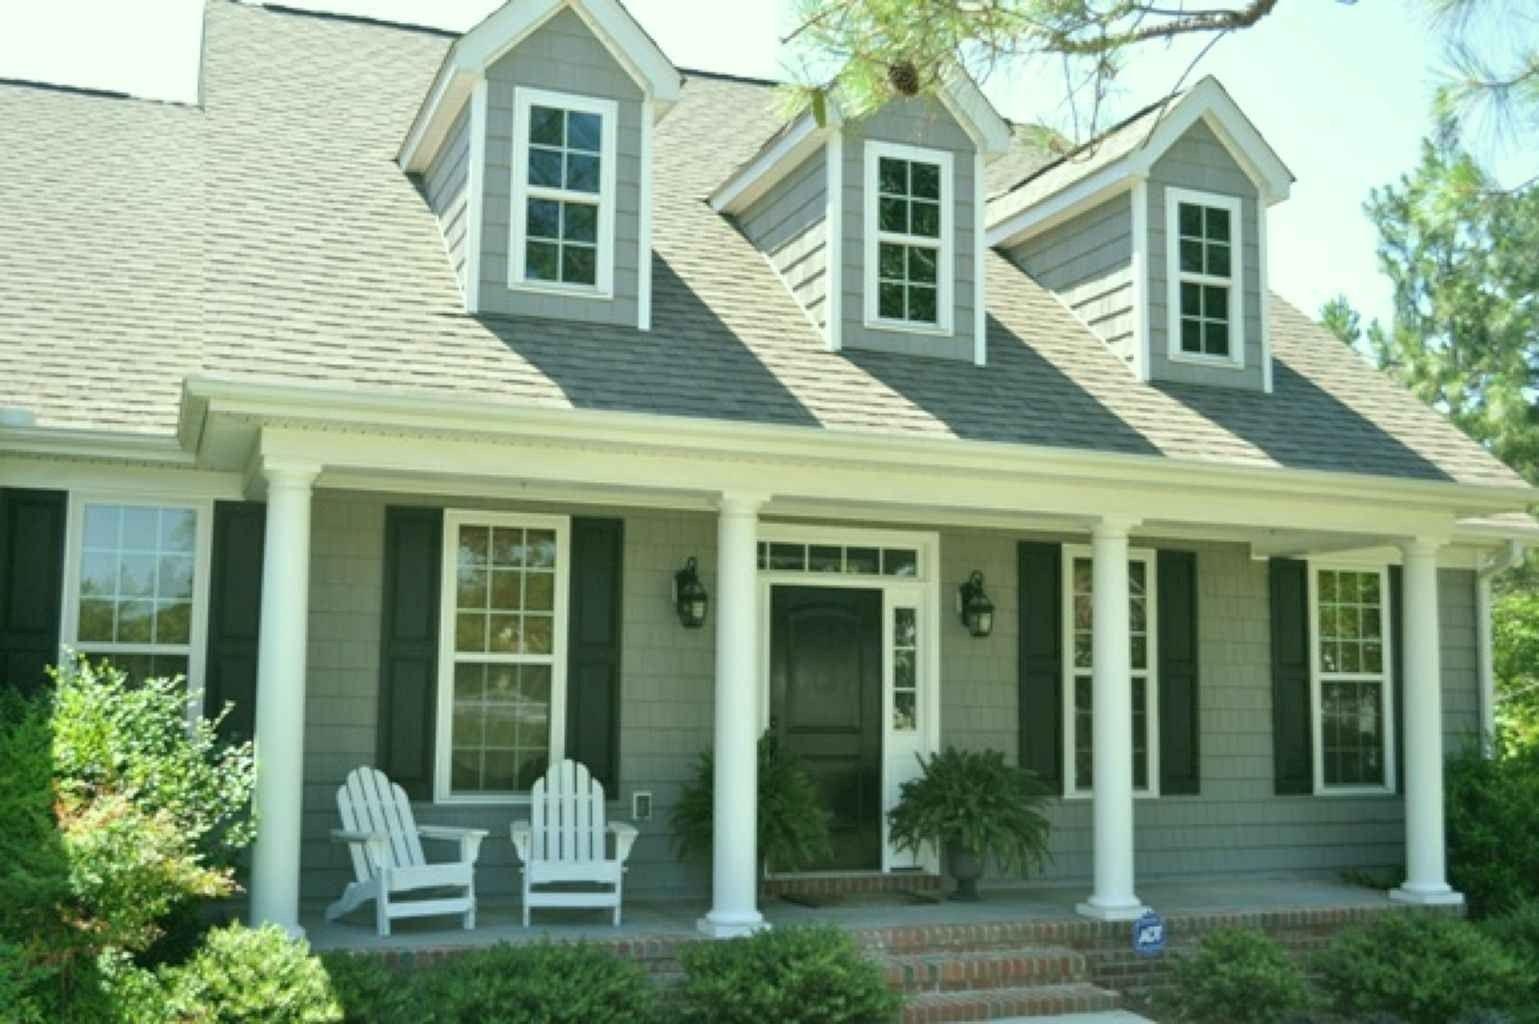 46 Conventional Cape Cod House Exterior Ideas Page 49 Of 49 House Paint Exterior Exterior Paint Colors For House Exterior House Colors